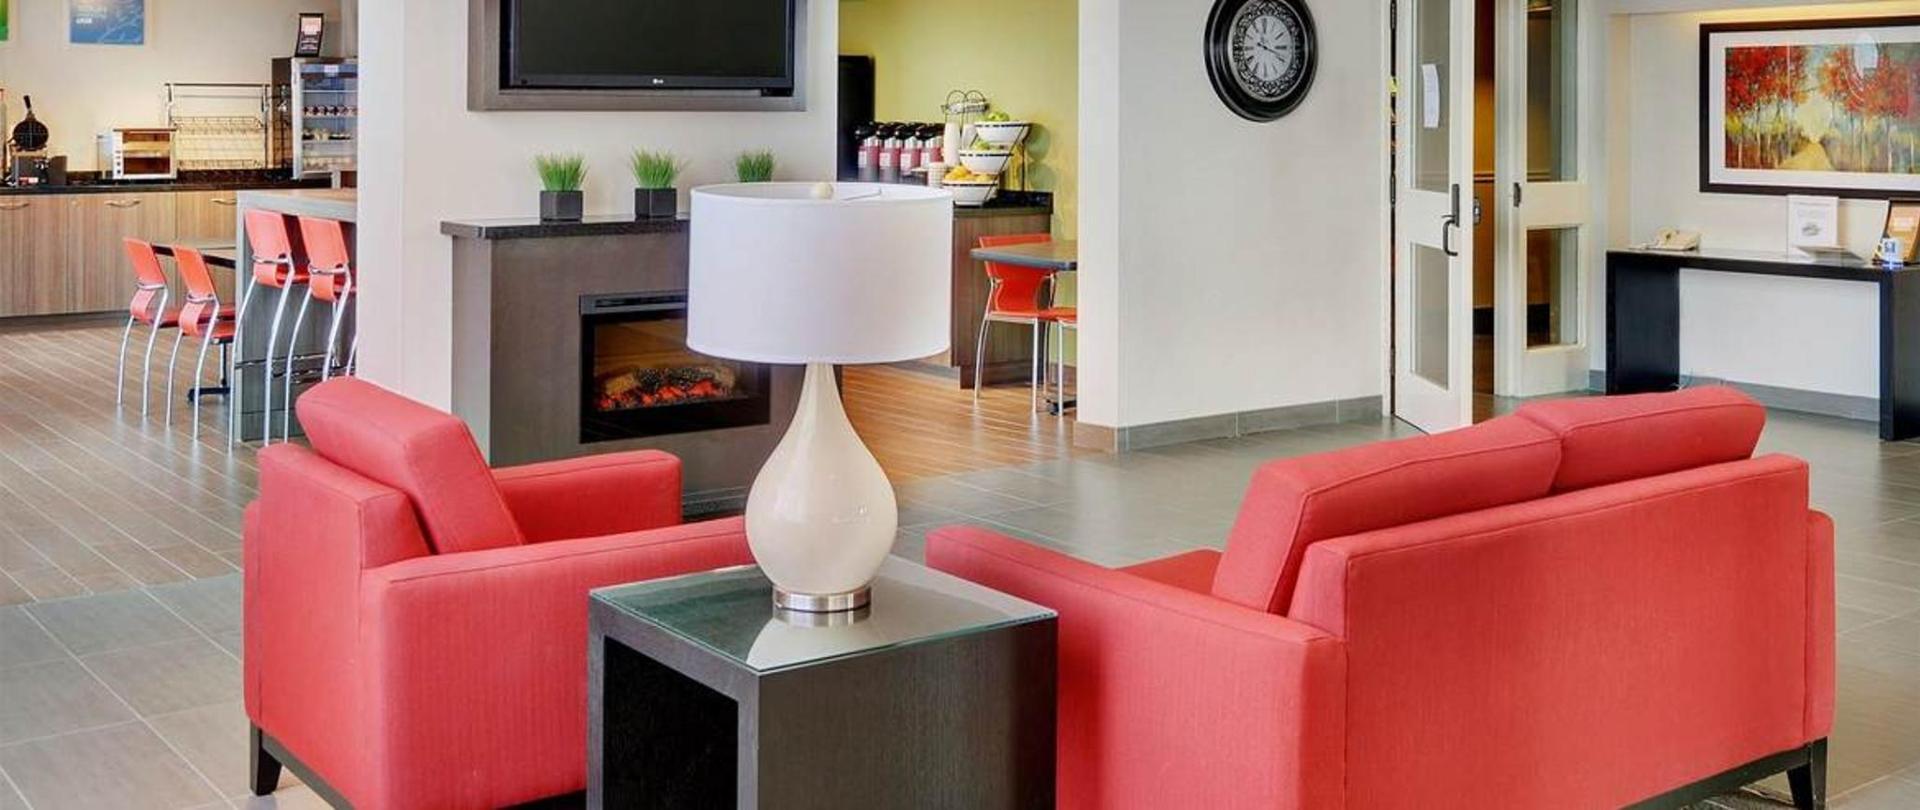 rediscover-your-comfort-inn-sudbury.jpg.1170x493_default.jpg